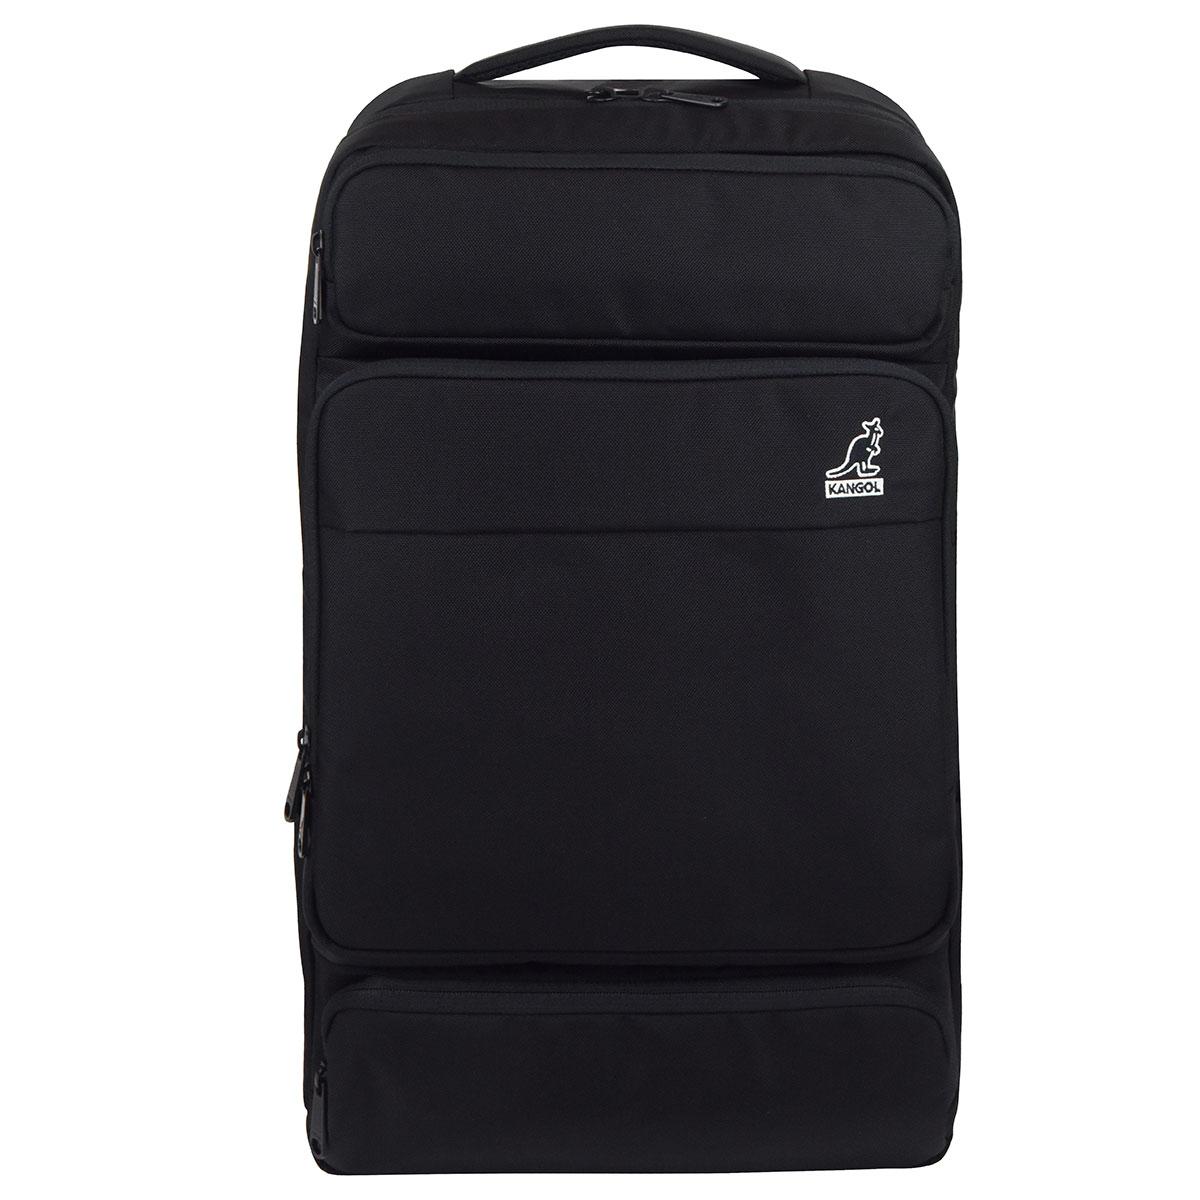 Kangol Remind Backpack in Black